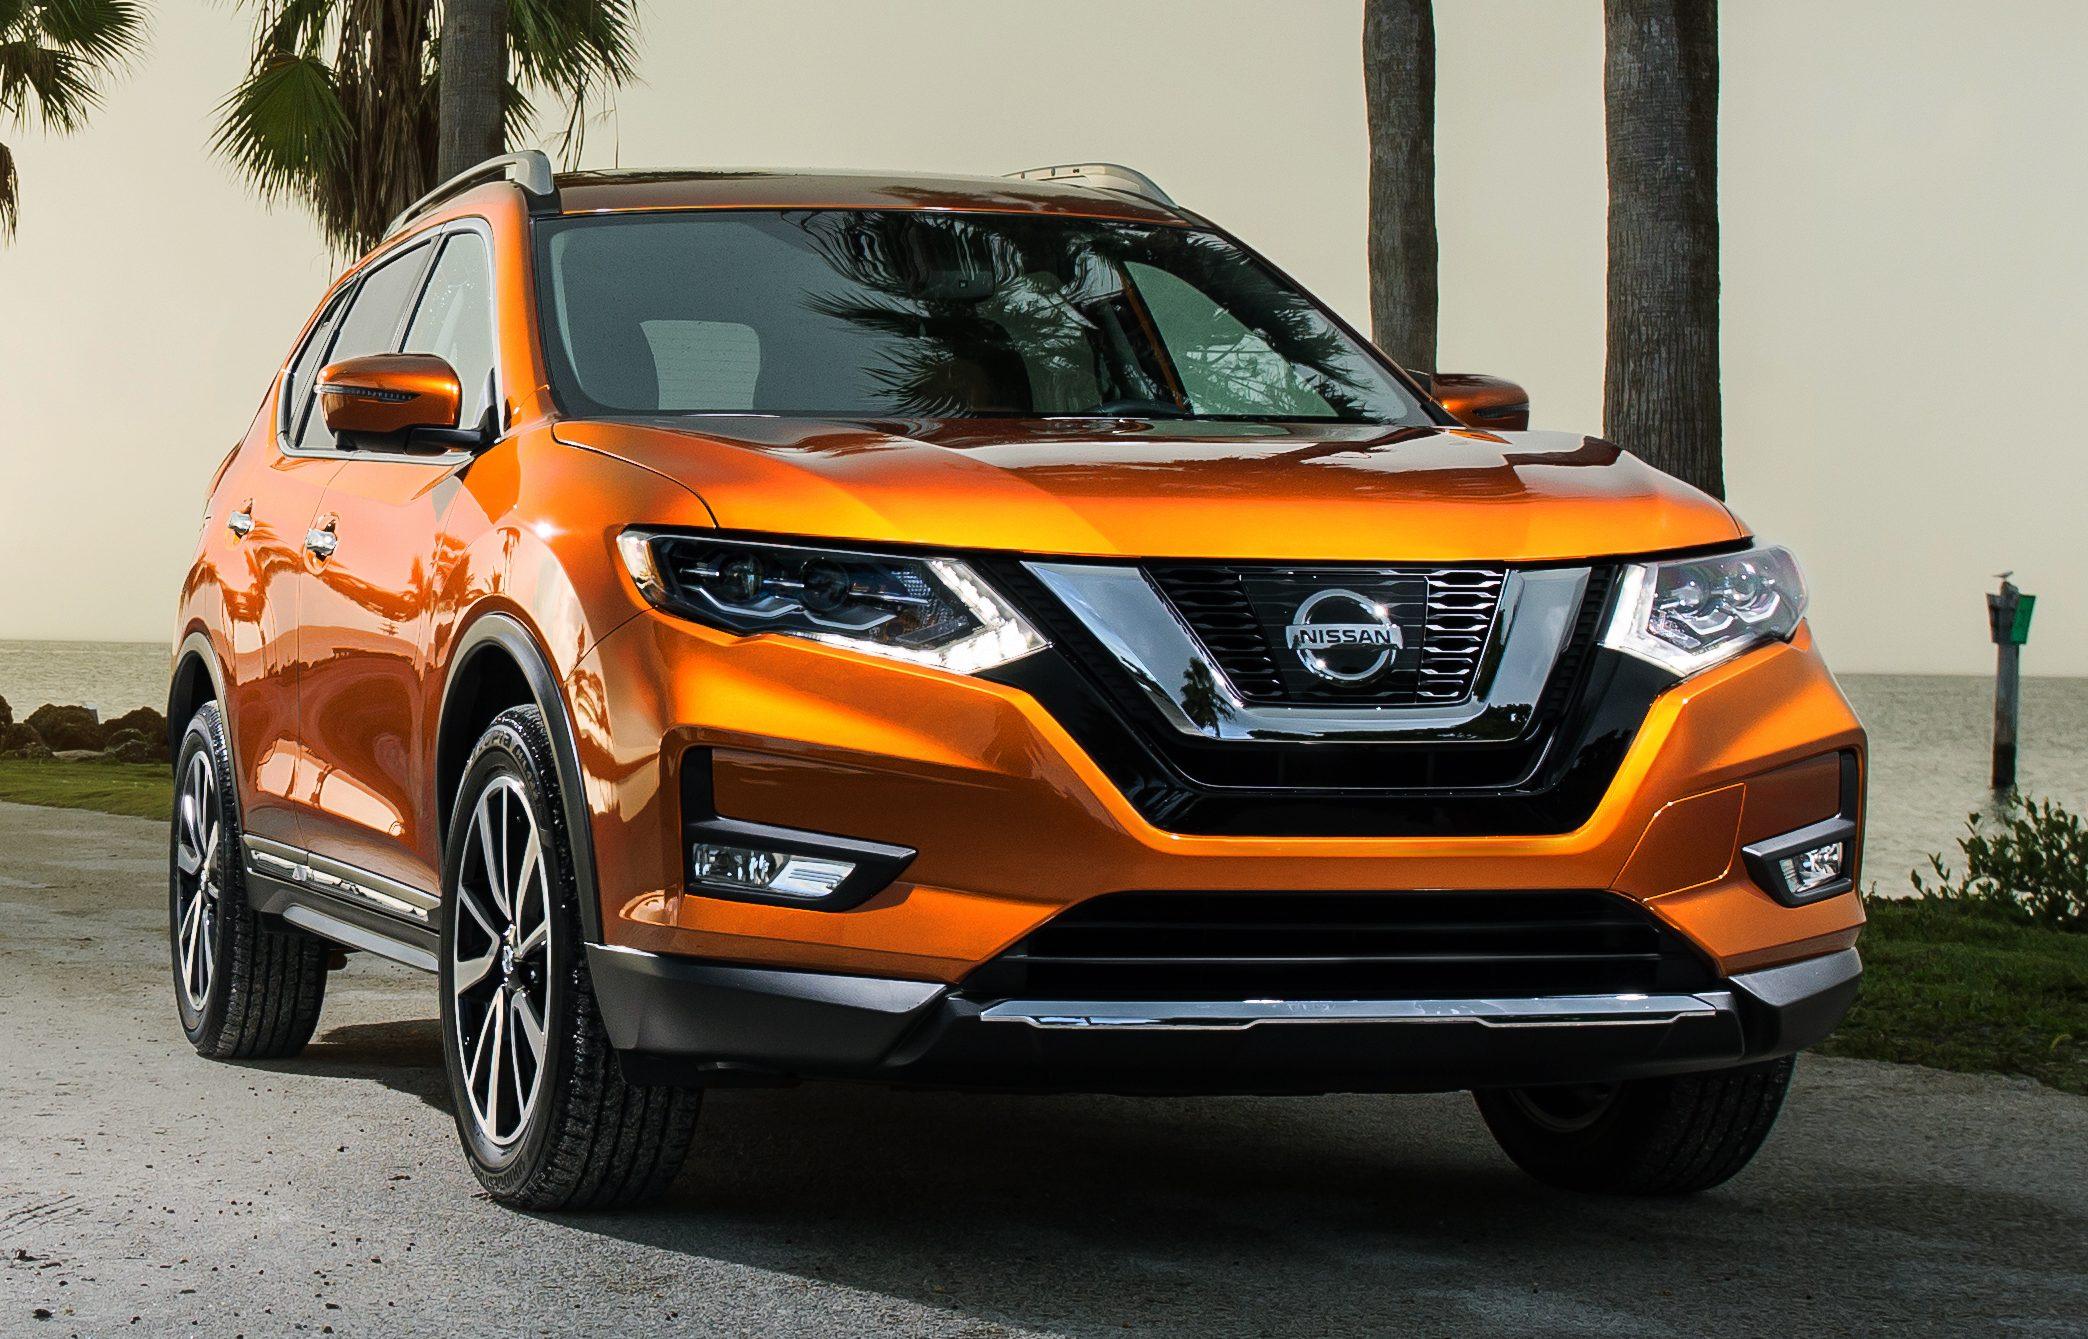 Nissan Rogue 2018 >> 北美 Nissan Rogue 小改款面市,本地 X-Trail 会跟进吗? 2017 Nissan Rogue SL - Paul Tan 汽车资讯网